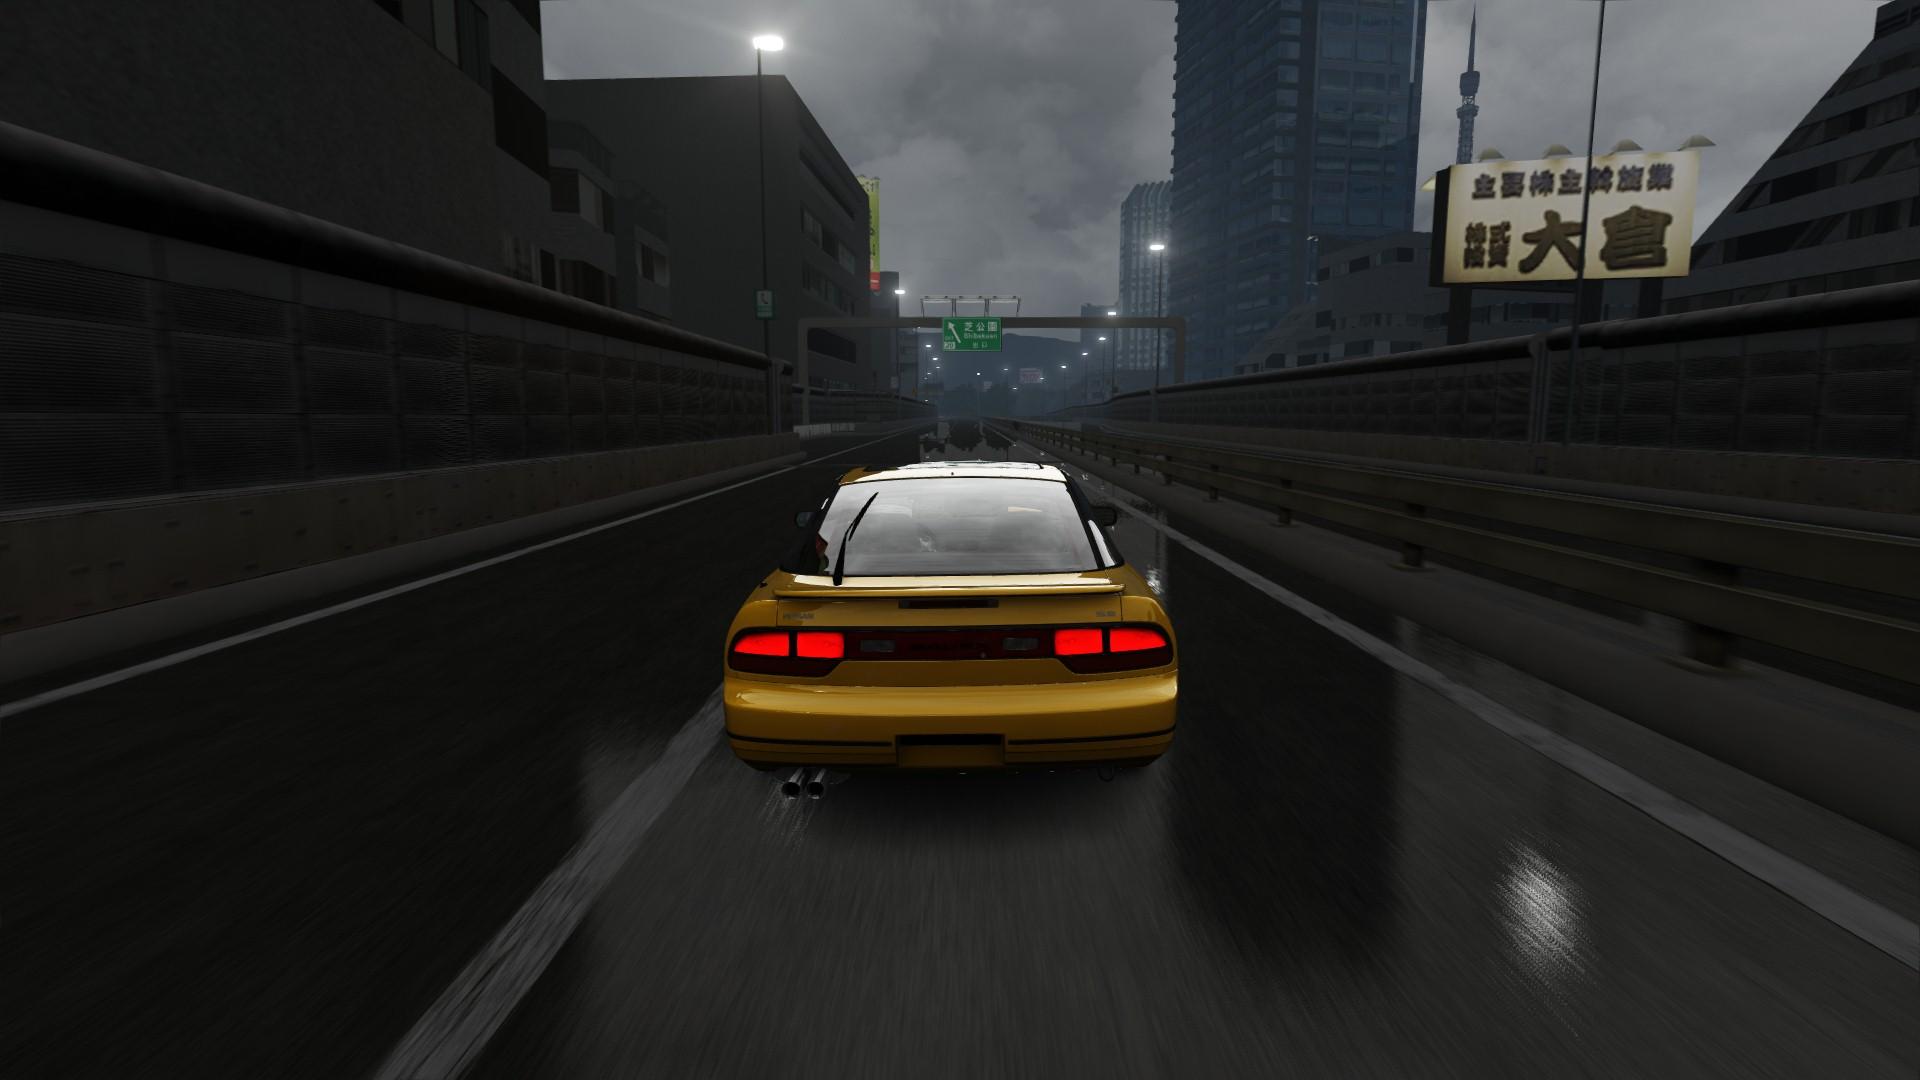 Assetto Corsa + Rain | Page 3 | Assetto Corsa Mods